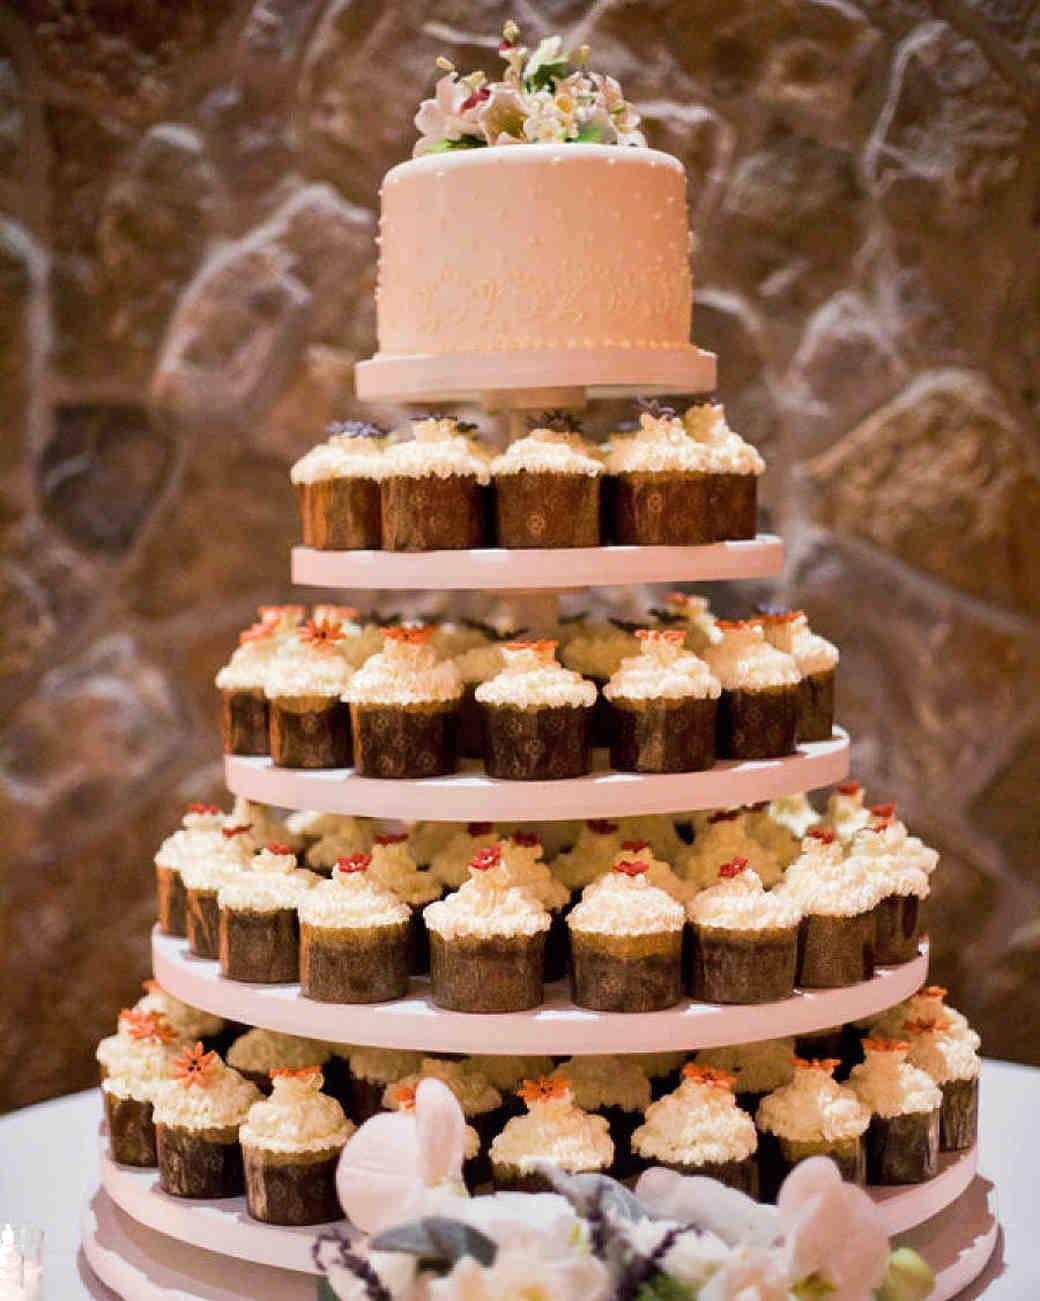 Alternative Wedding Cakes Ideas  24 Delicious Wedding Cake Alternatives